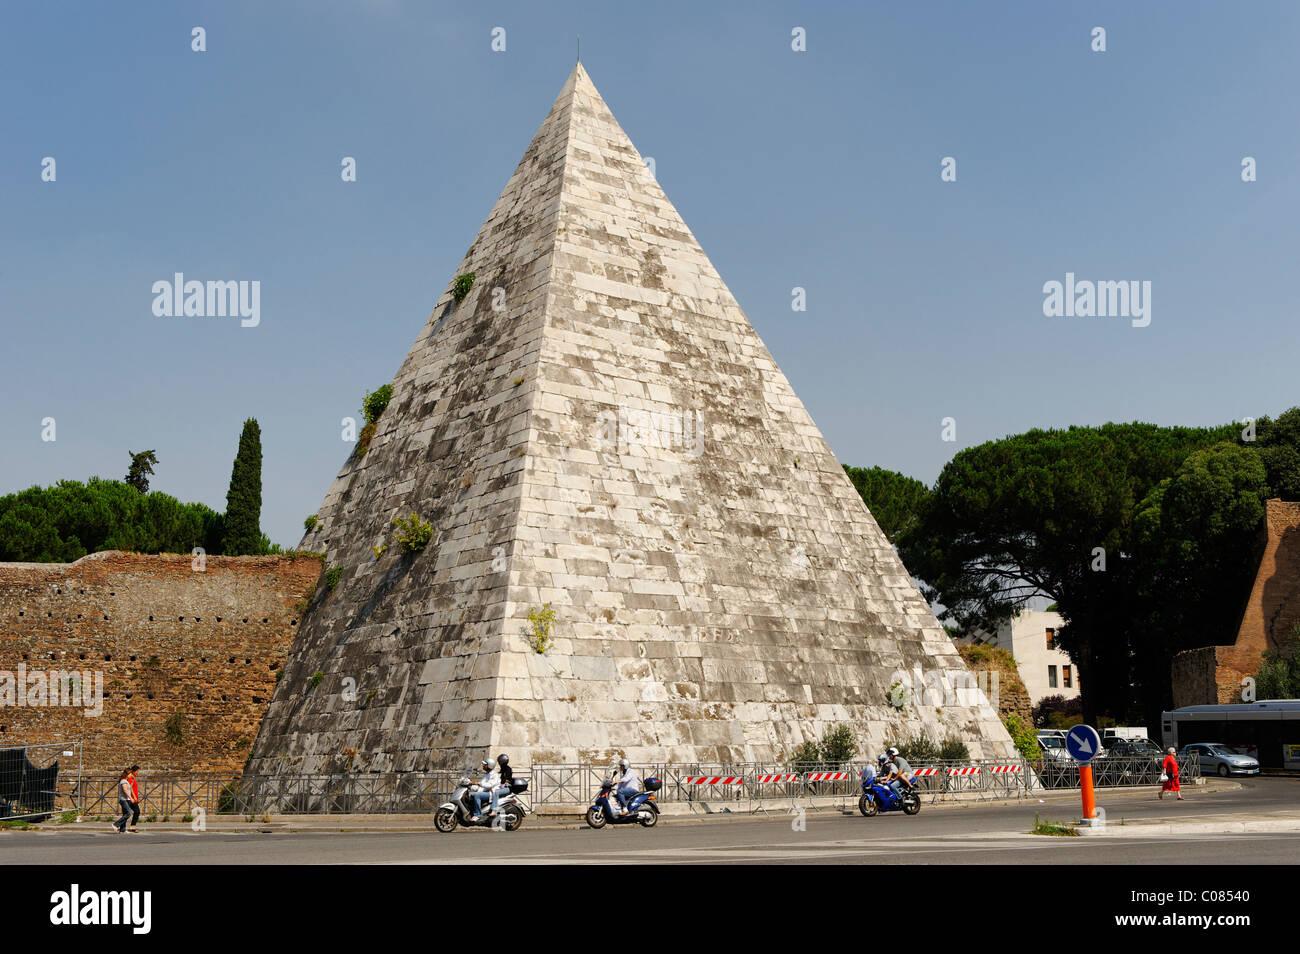 Cestius Pyramid, Piramide di Caio Cestio, Piazzale Ostiense, Rome, Italy, Europe Stock Photo